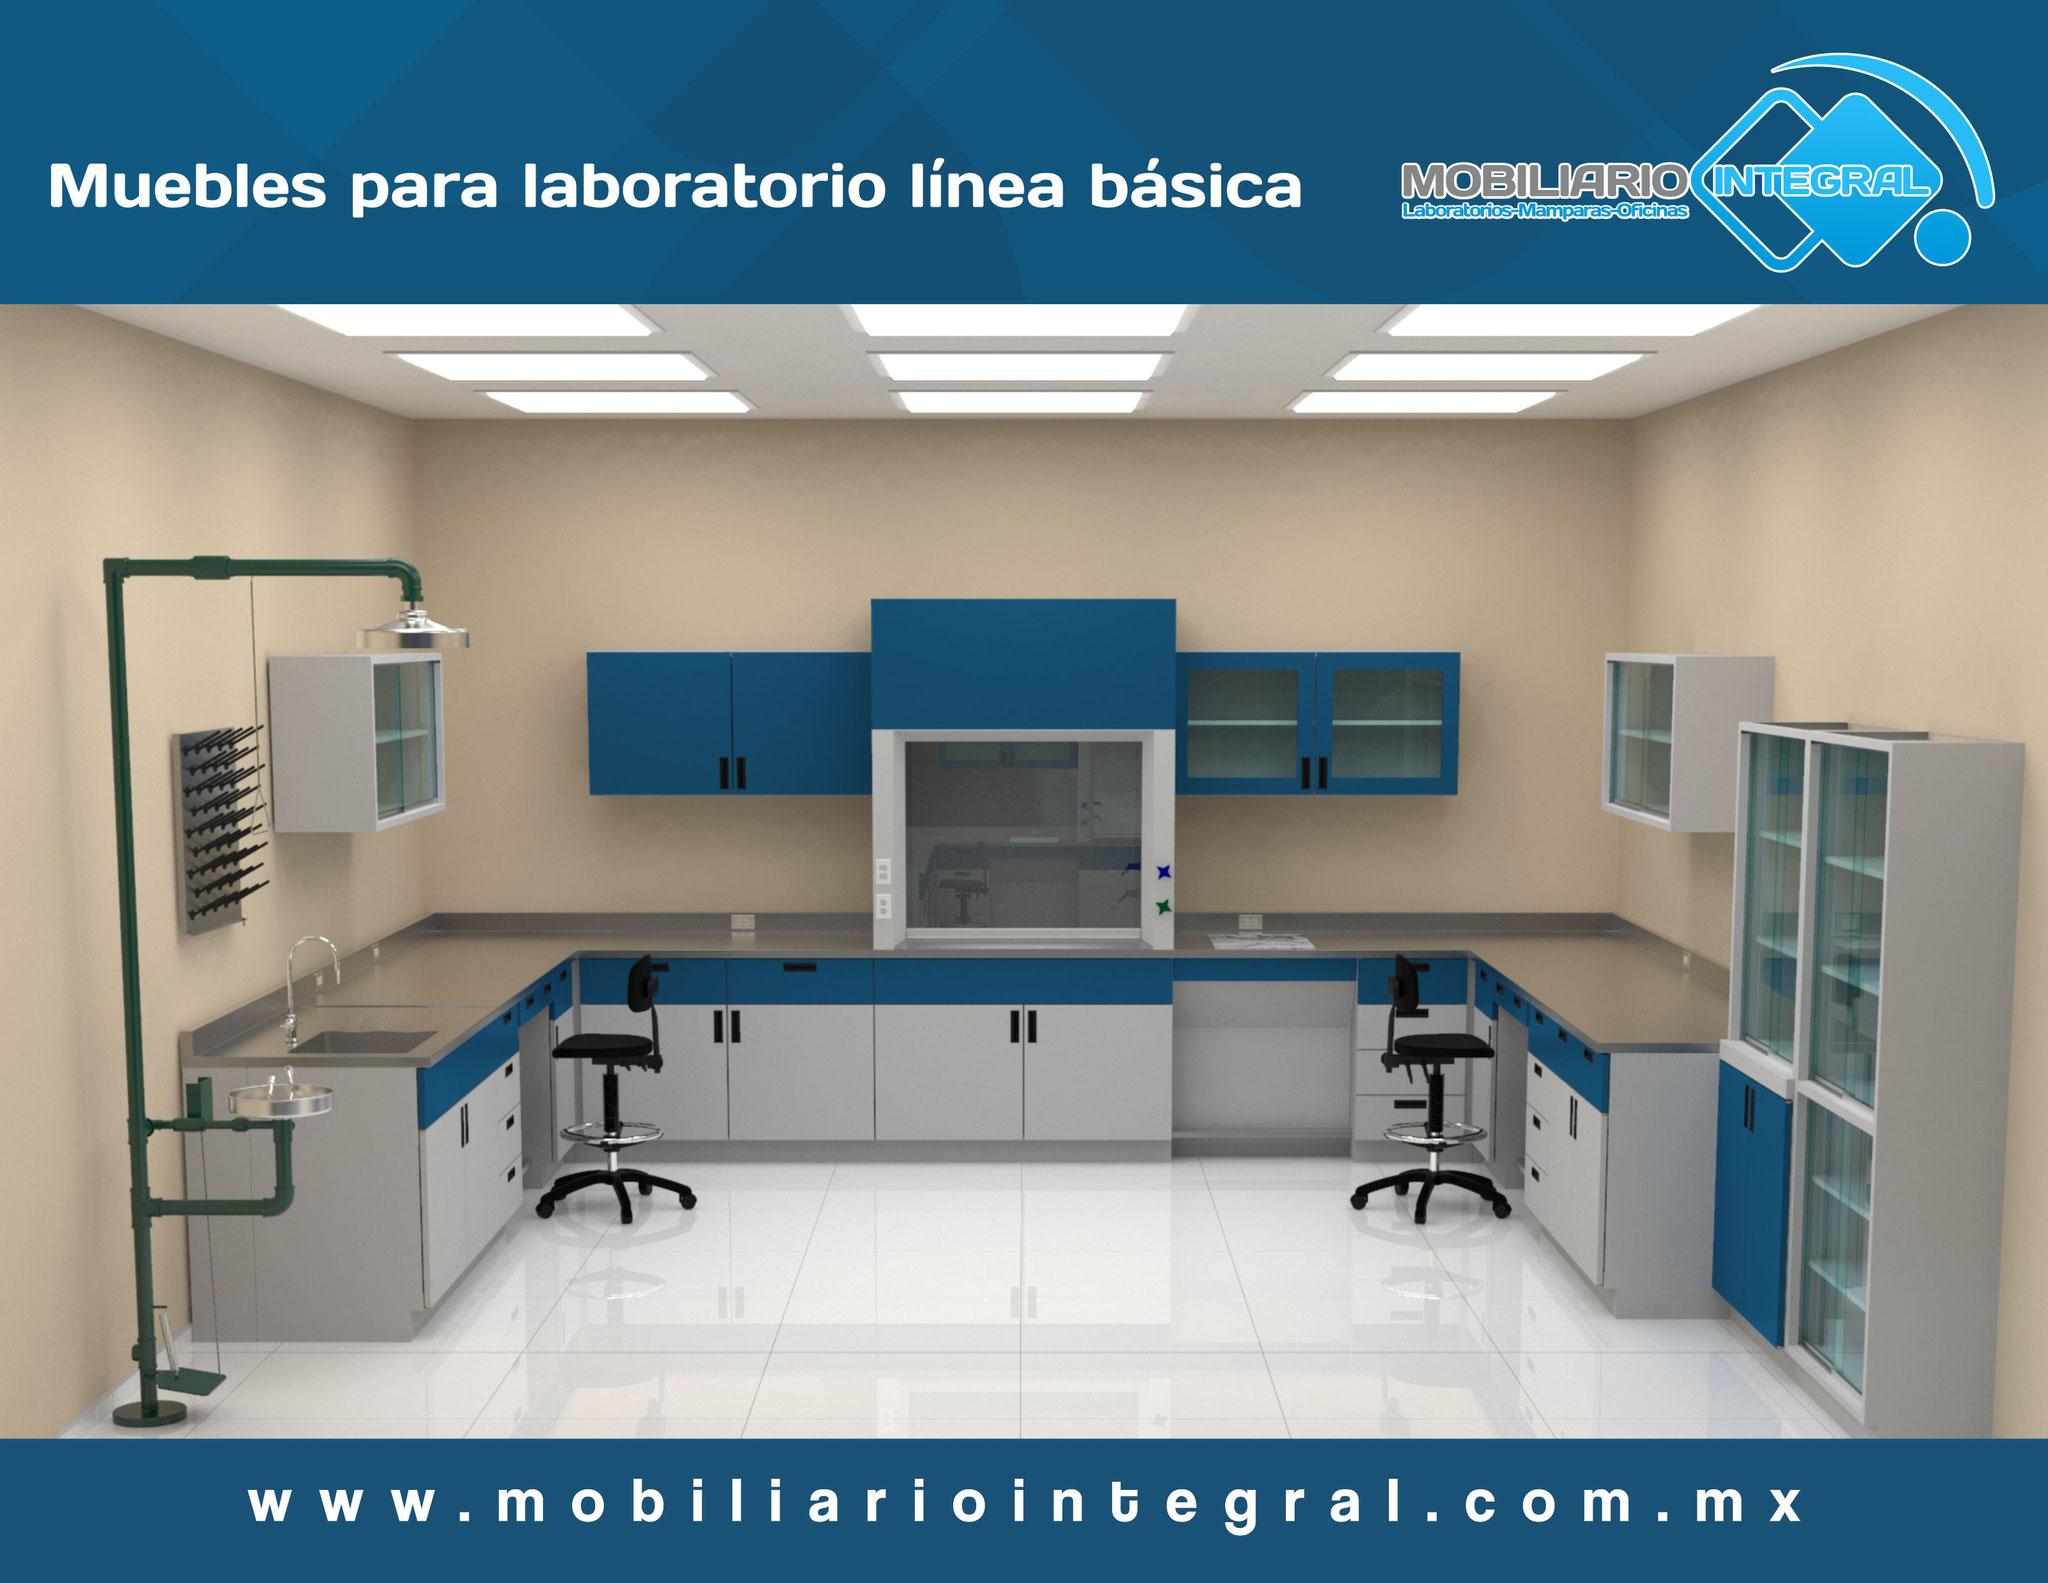 Muebles para laboratorio en Tuxtla